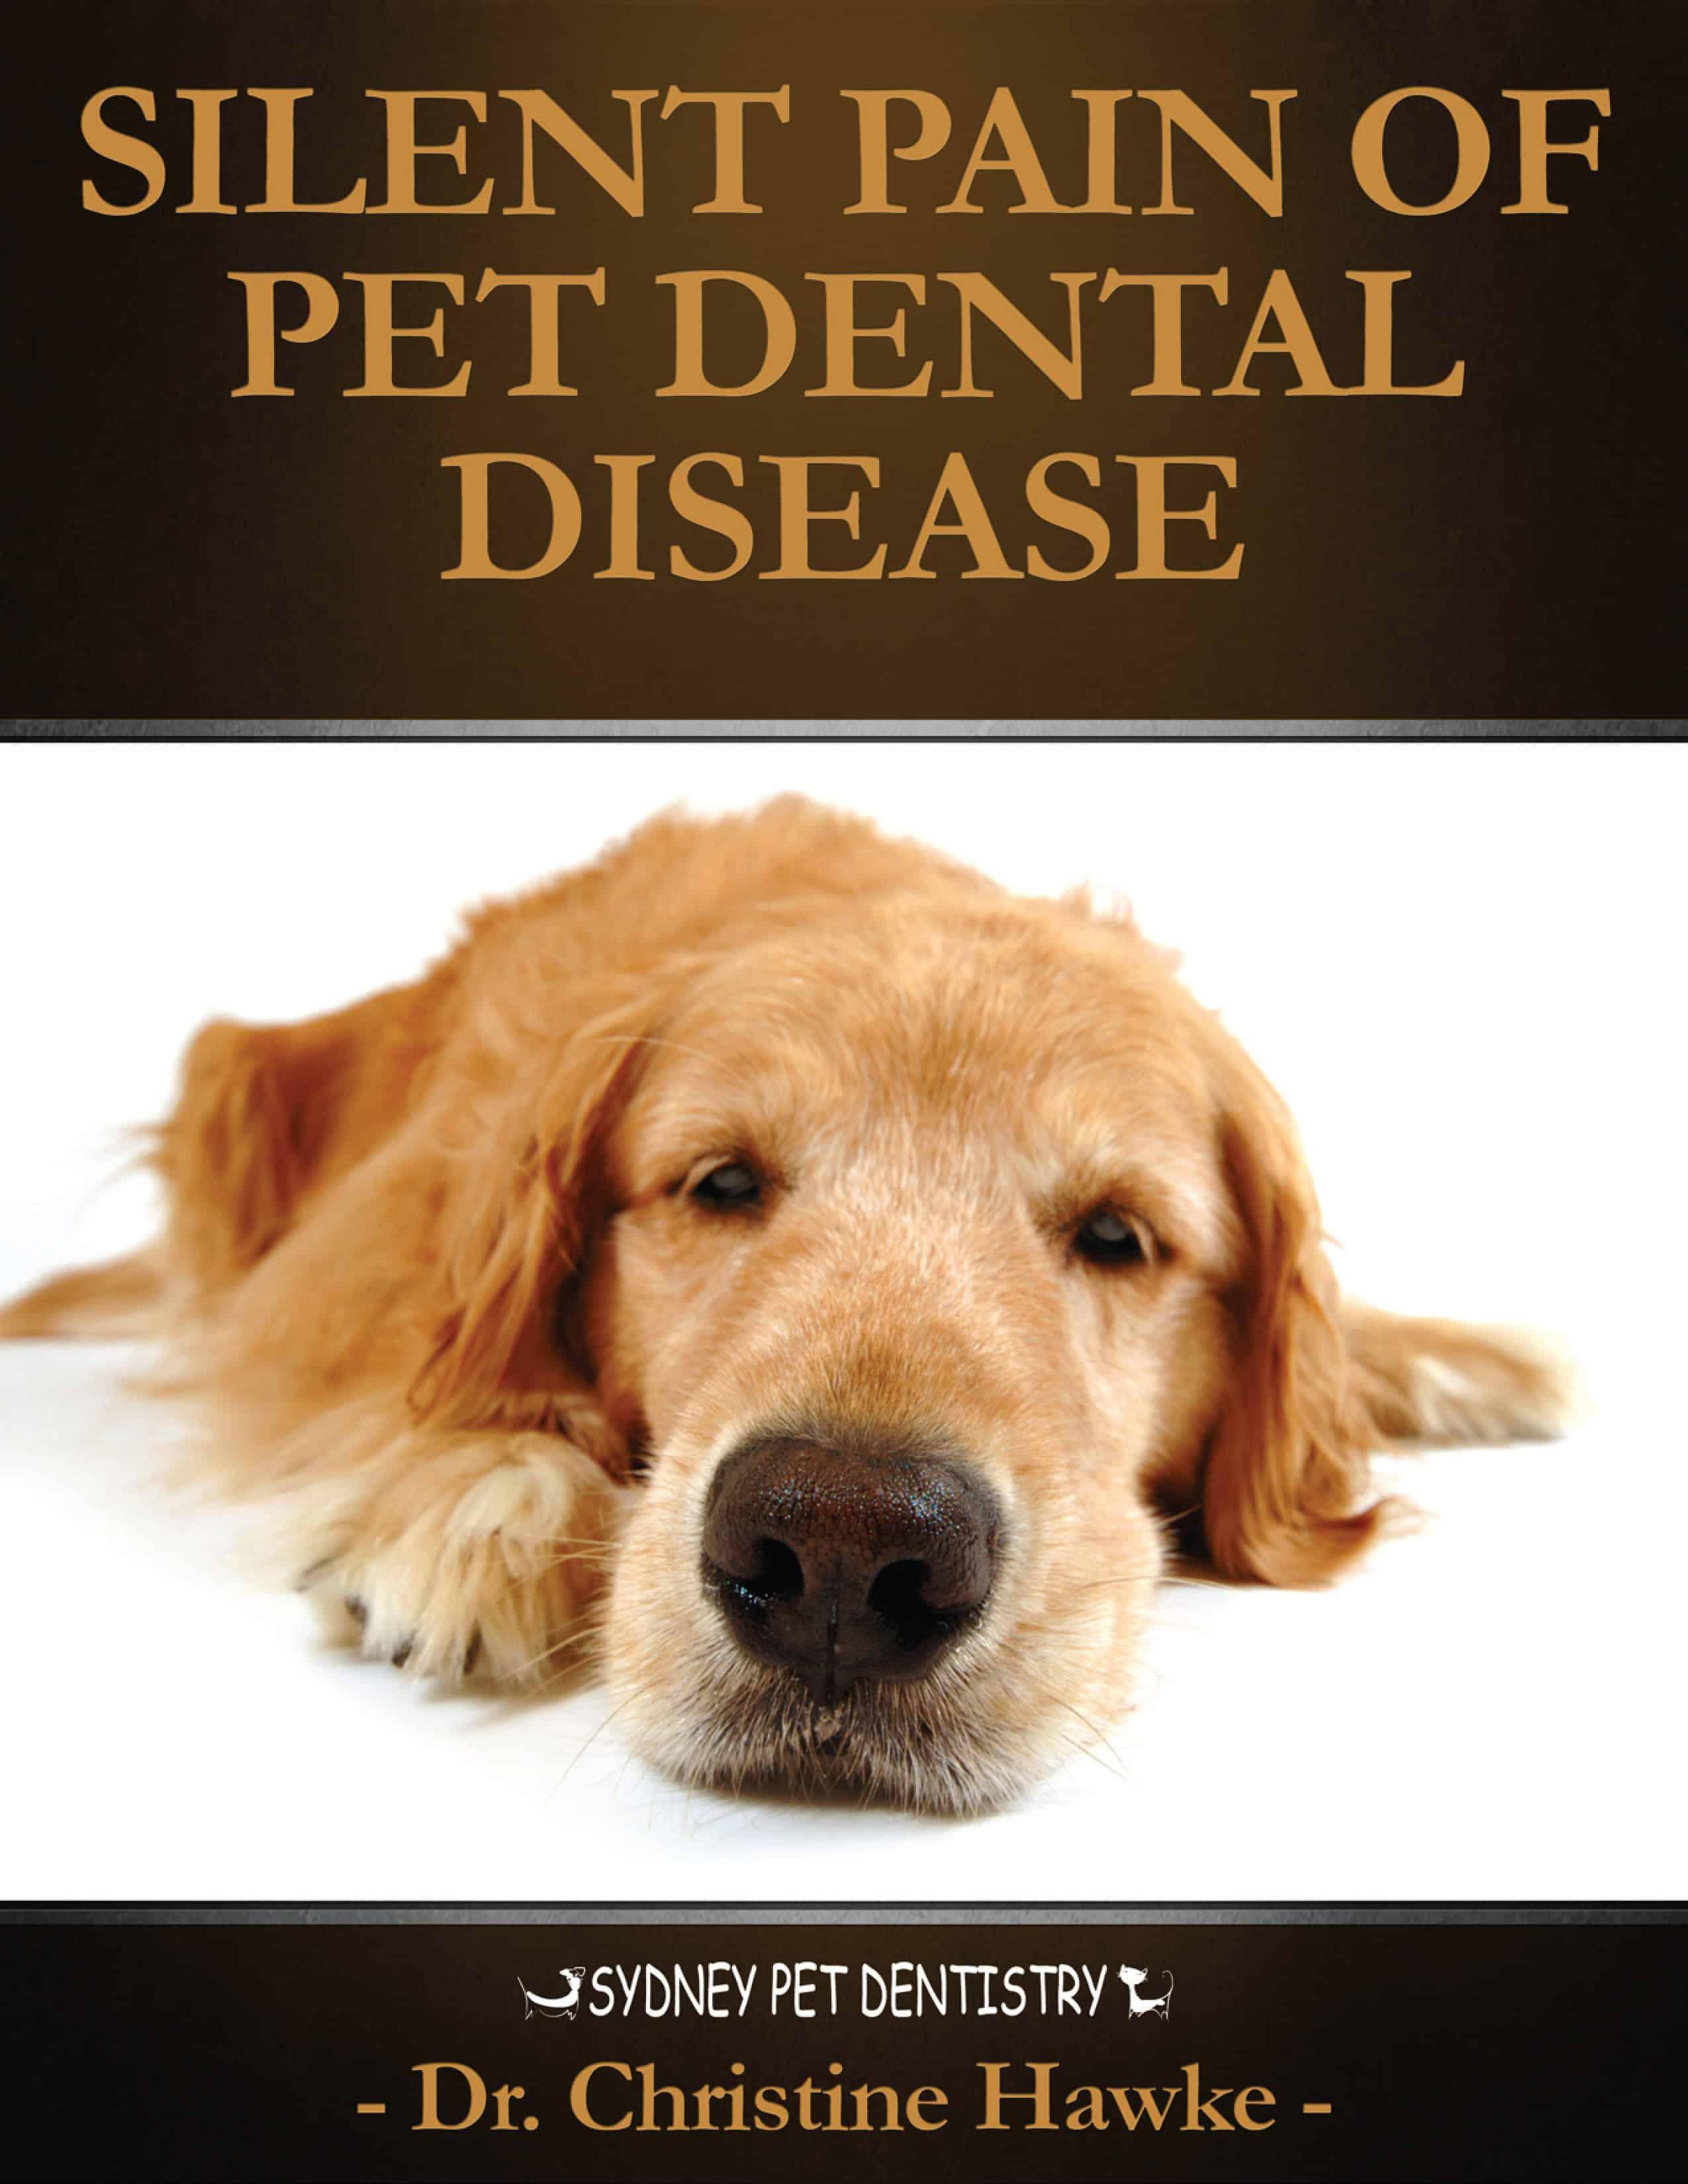 The Silent Pain of Dental Disease